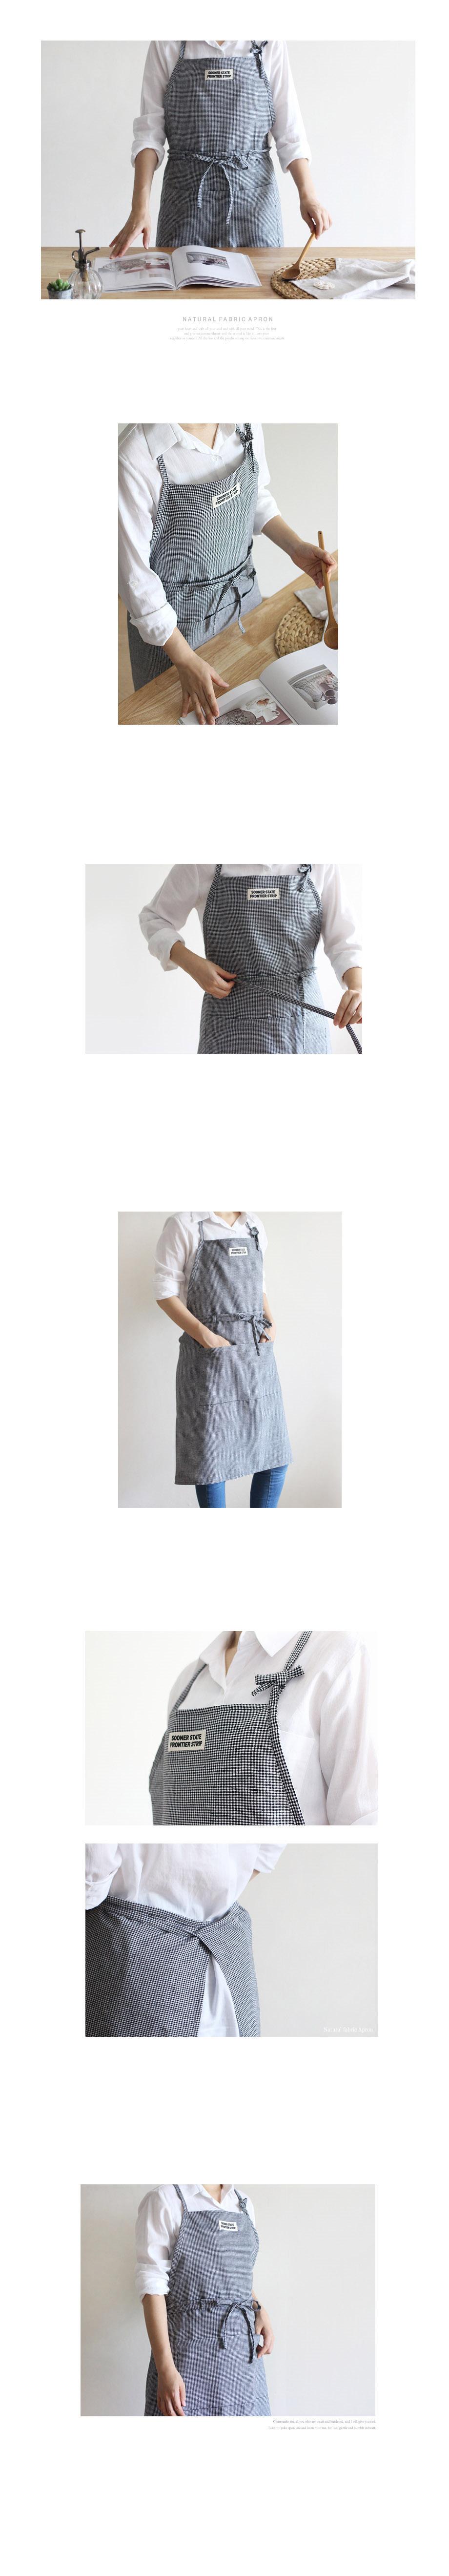 DS-S434미니블랙체크 앞치마 1P 카페 바리스타 남자 여자 공용 - 리빙톡톡, 15,500원, 앞치마, 원피스 앞치마